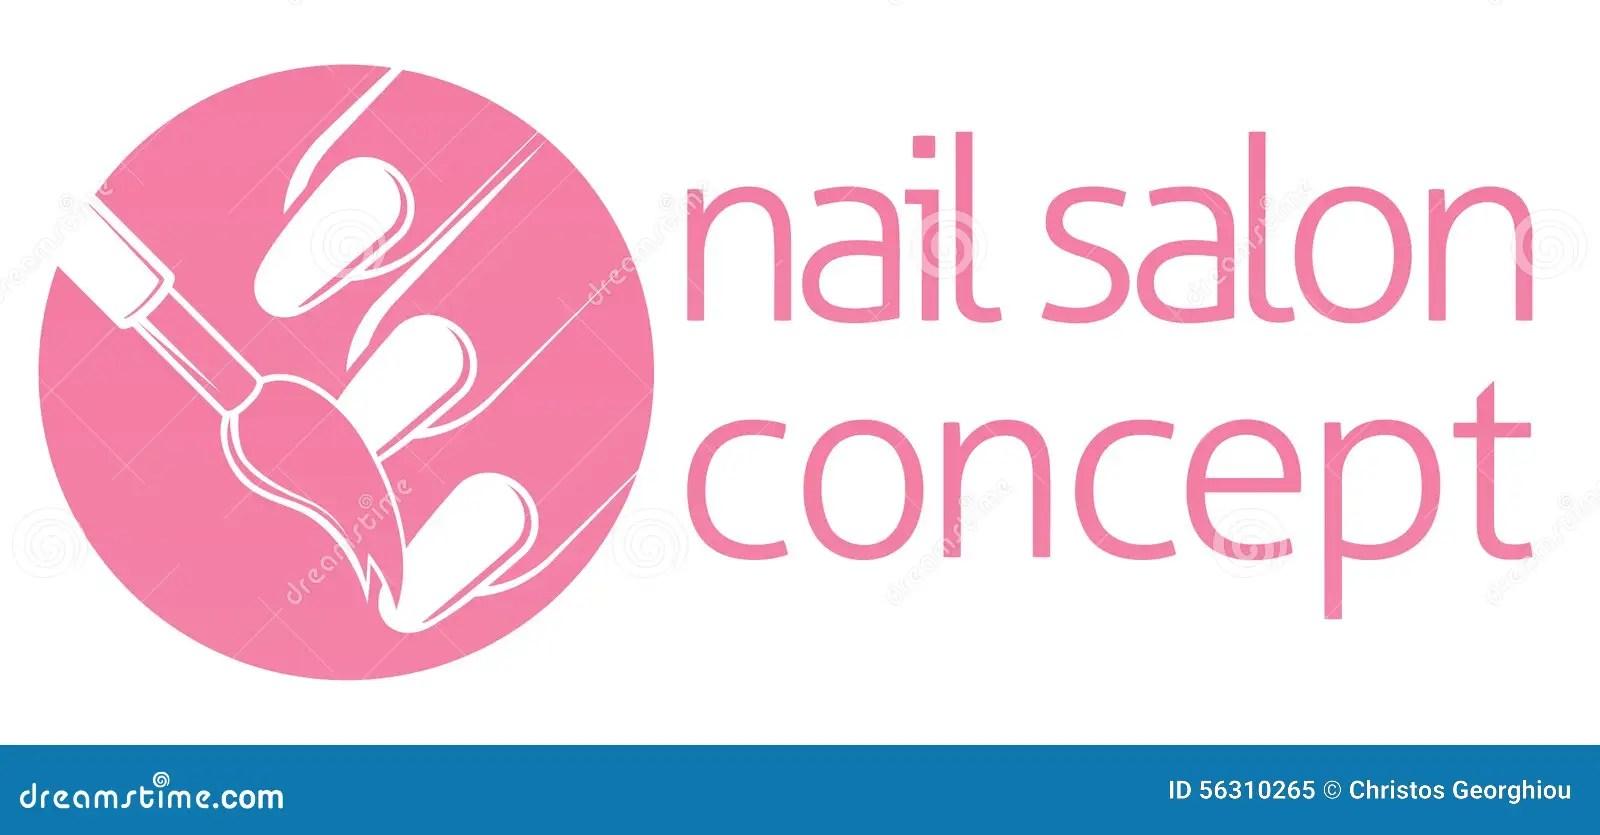 Thefinanceresource Free Hair Salon And Nail Salon Nail Salon Or Bar Concept Stock Vector Image 56310265